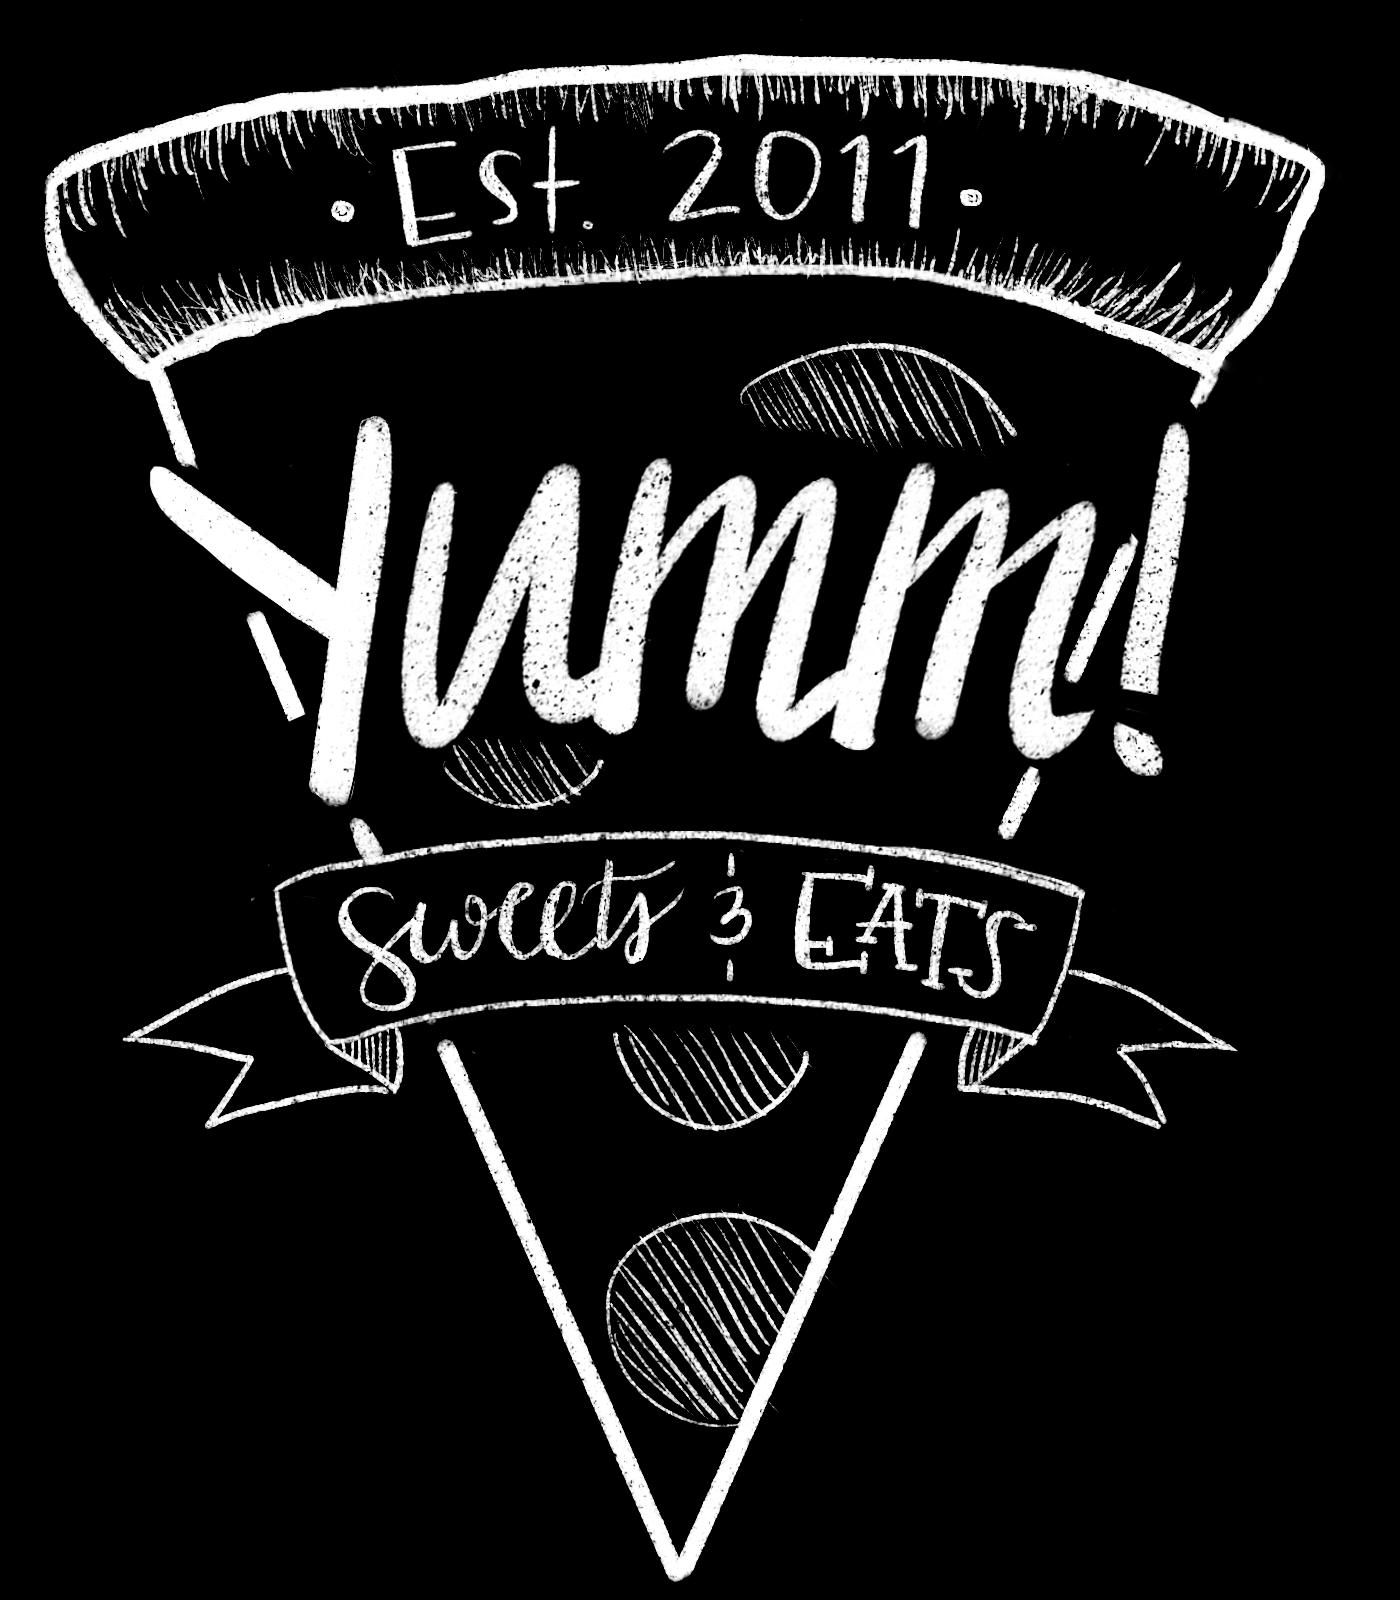 Yumm! Sweets and Eats